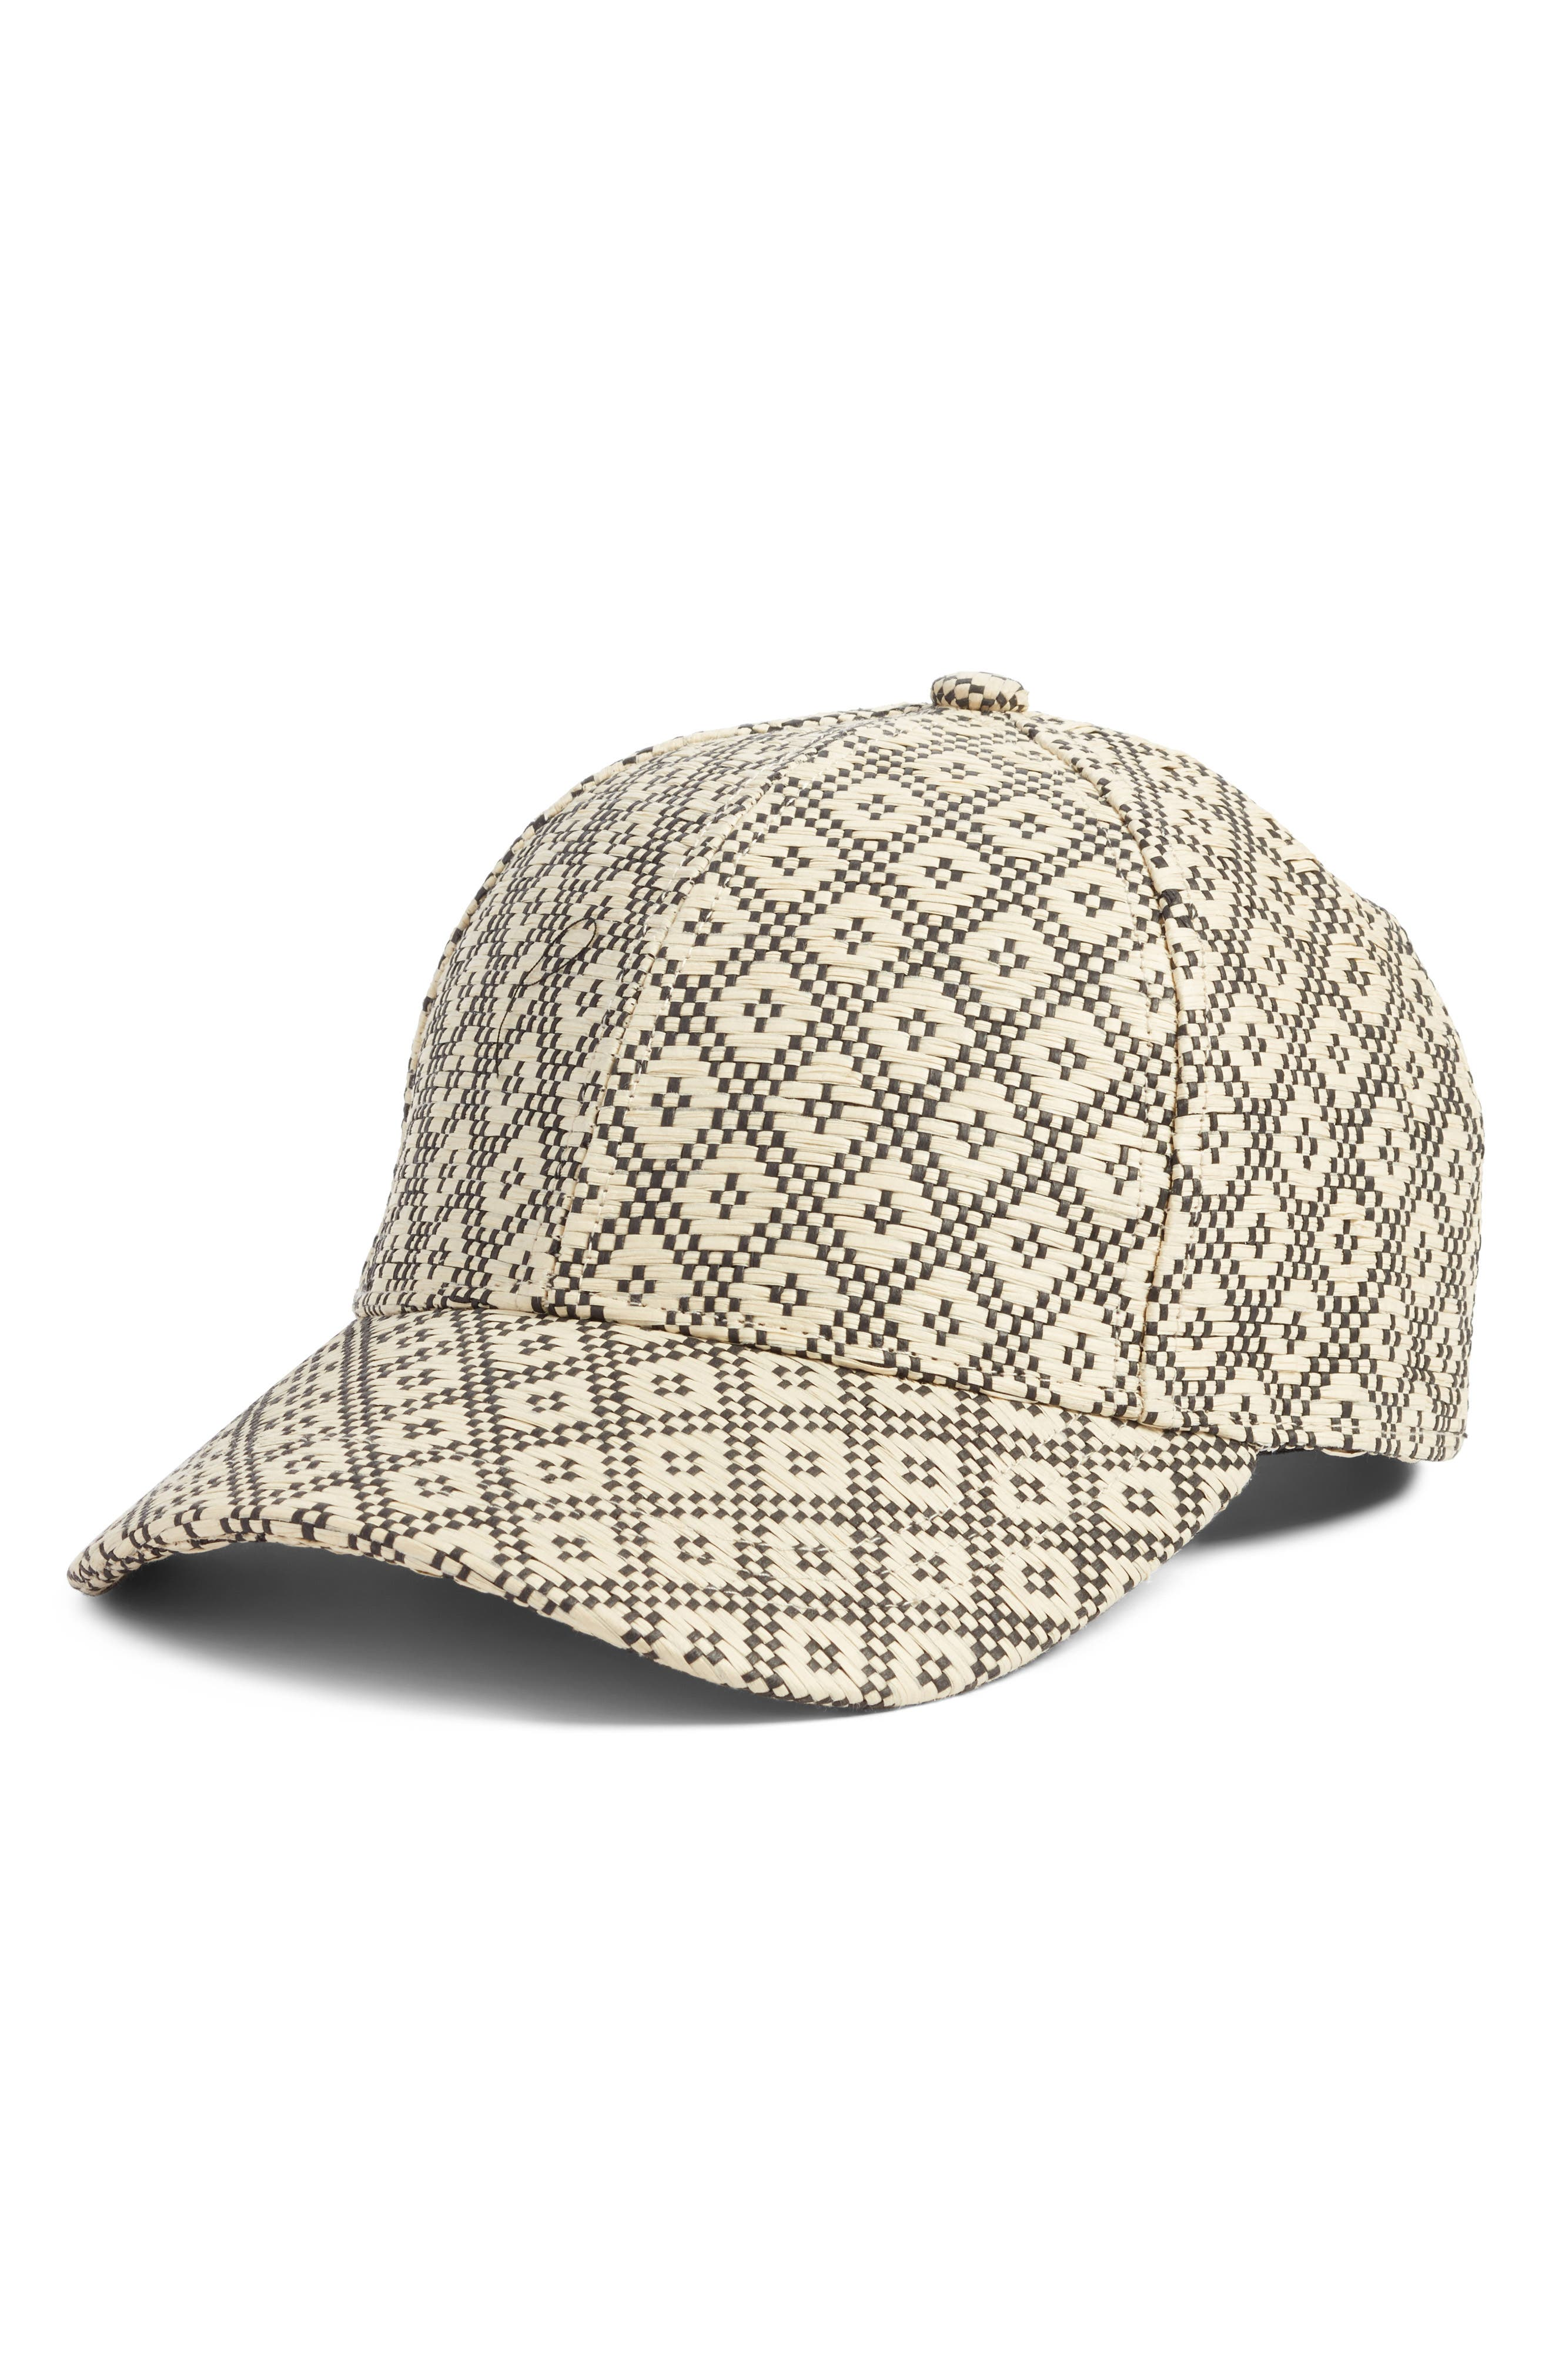 Geo Straw Baseball Cap,                         Main,                         color, 250